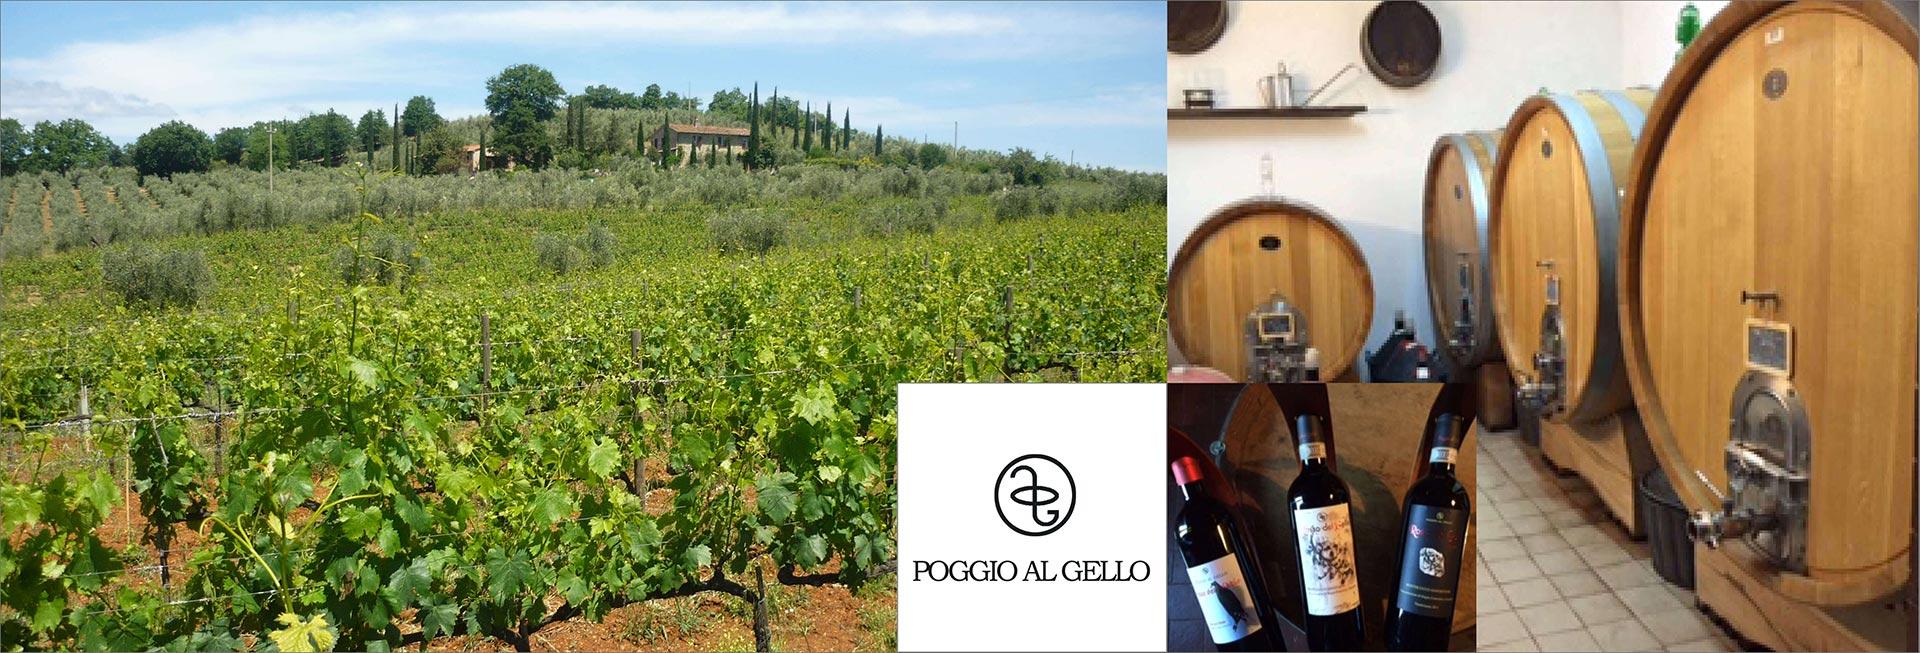 Weingut Poggio al Gello - Toskana